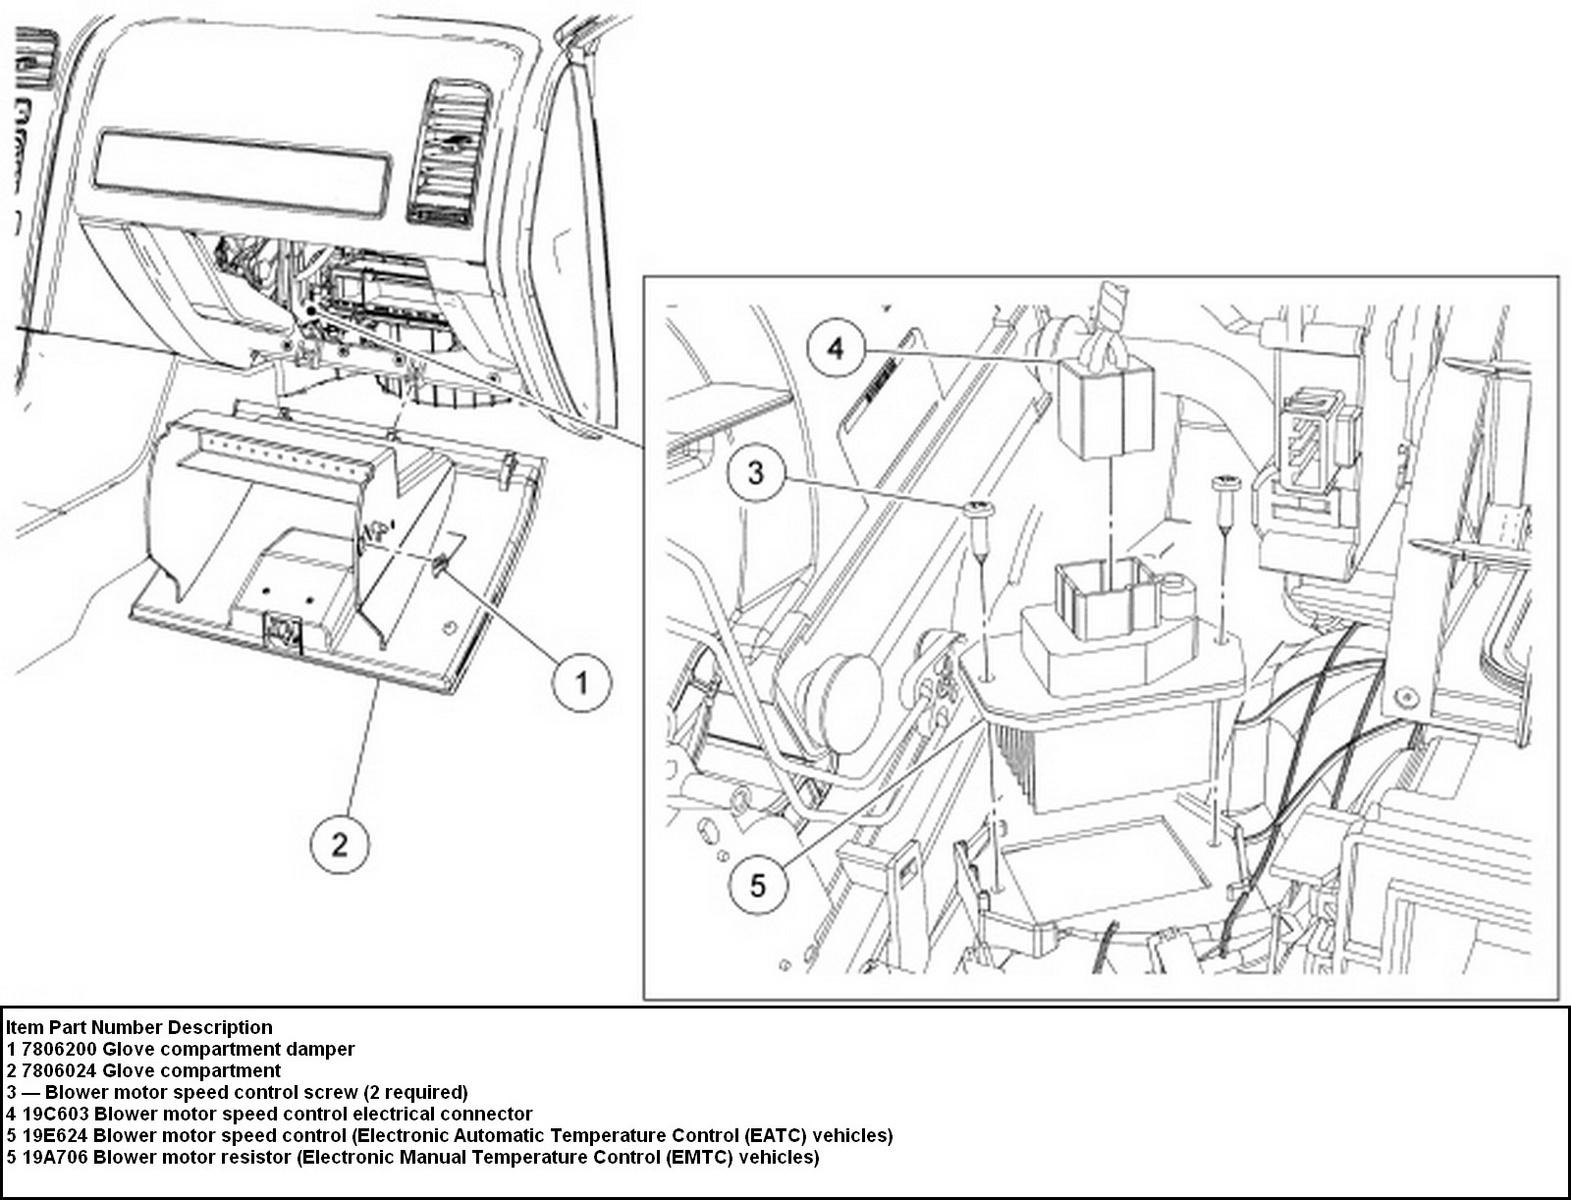 2014 chevy equinox stereo wiring diagram